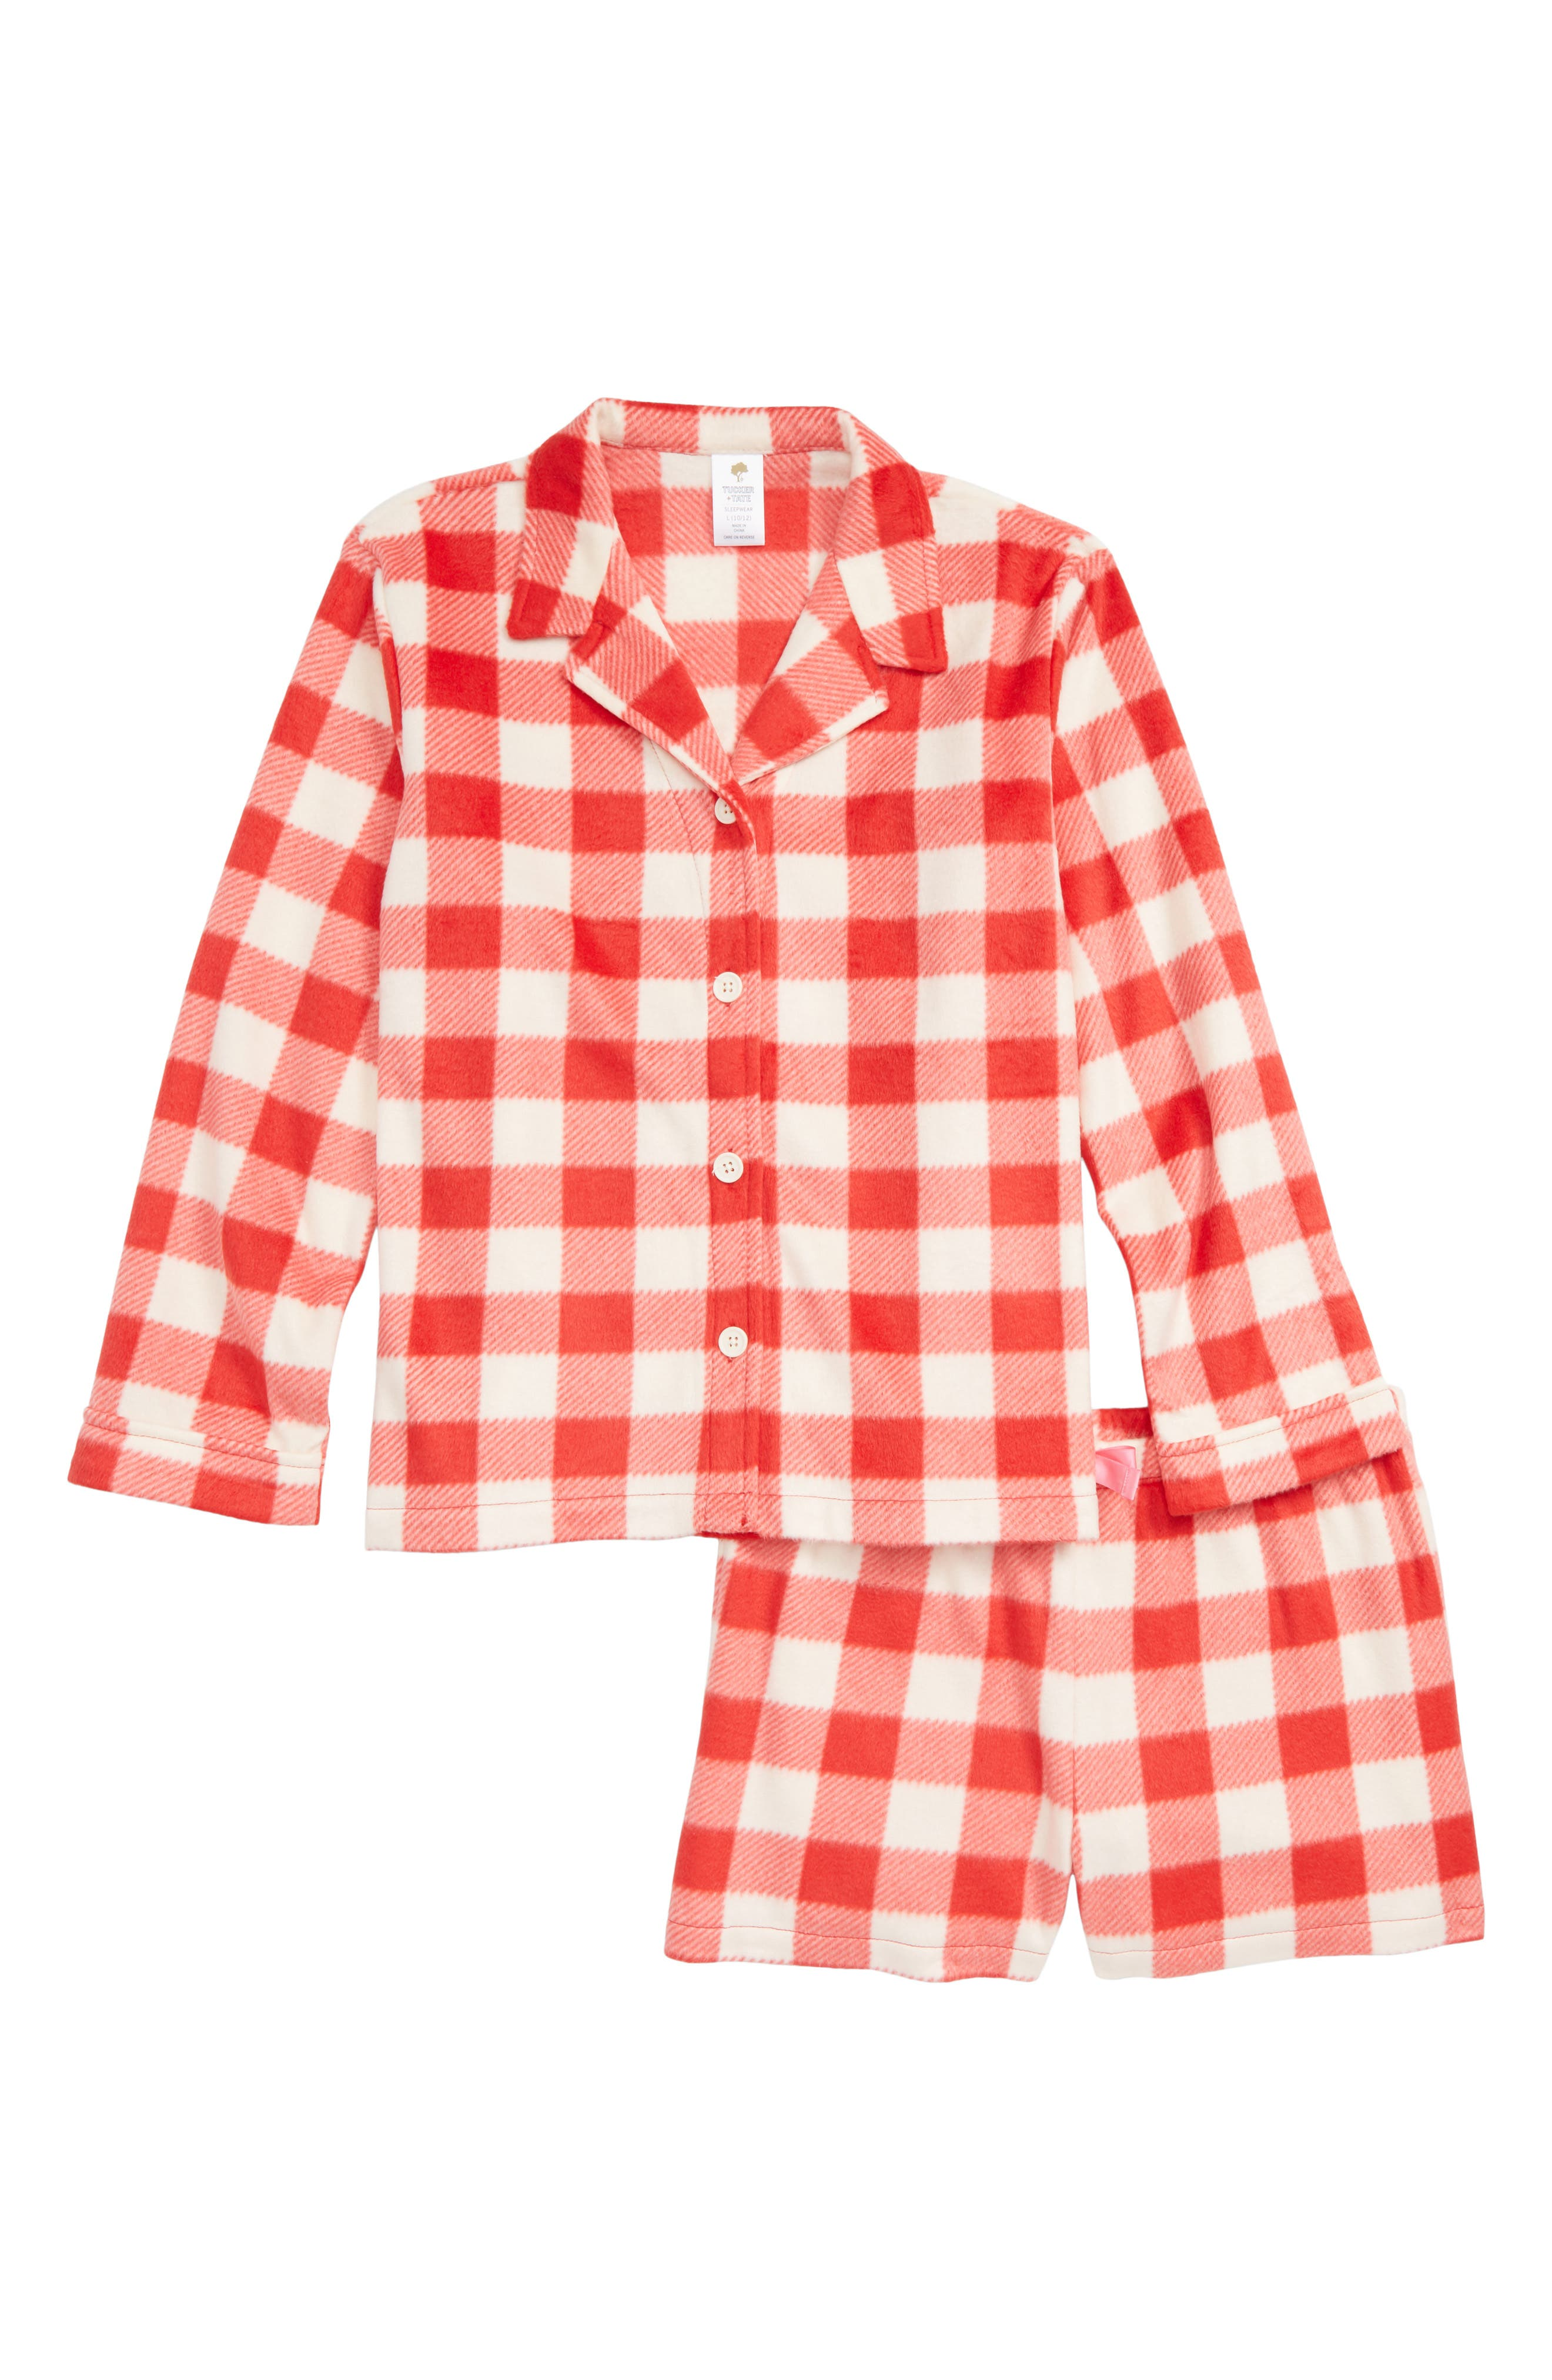 Collared Fleece Pajamas,                         Main,                         color, RED BLOOM CHECK